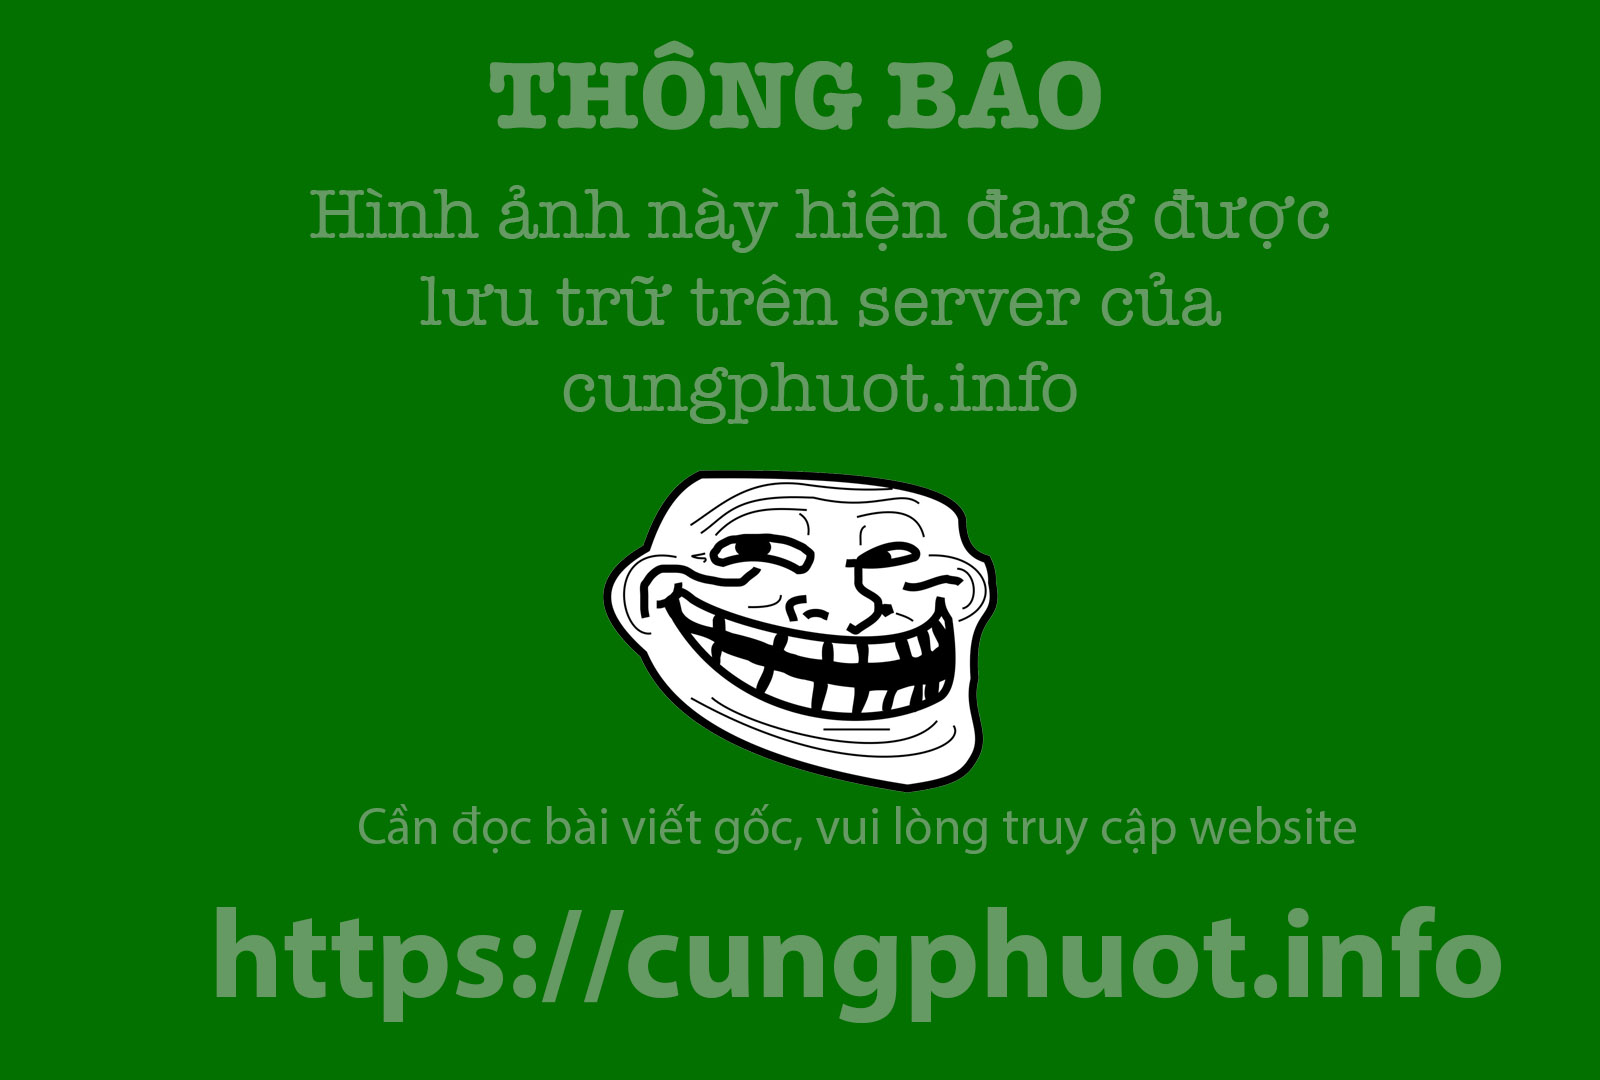 Chon bien cuong 'troi thap, dat cao' o Nam Can hinh anh 12